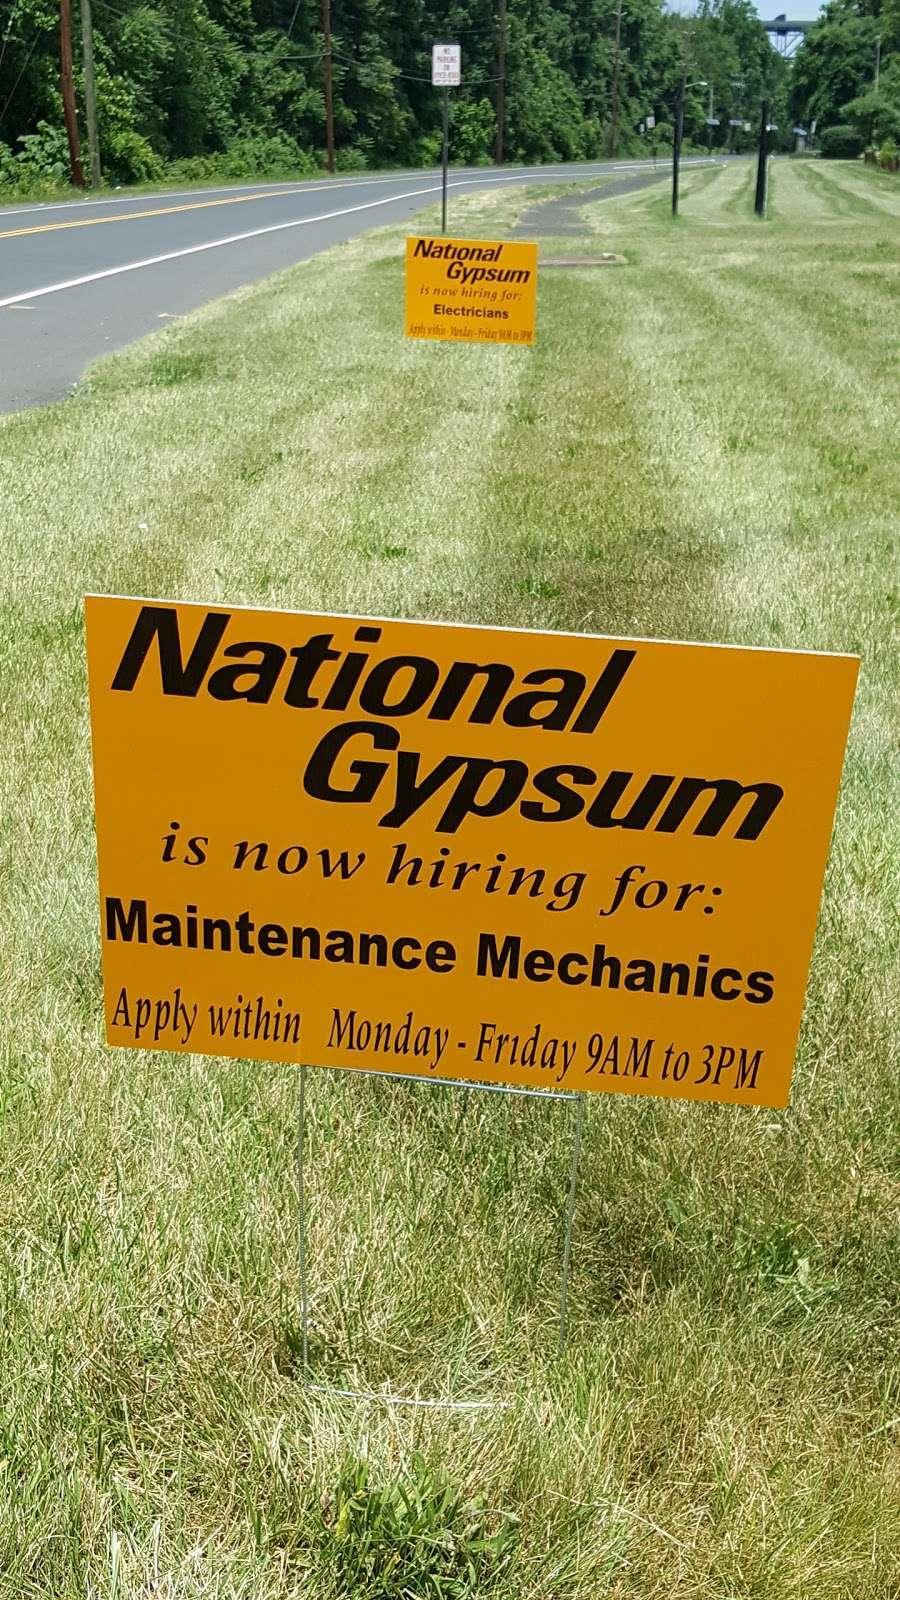 National Gypsum Co - hardware store  | Photo 4 of 5 | Address: 1818 River Rd, Burlington, NJ 08016, USA | Phone: (609) 499-3300